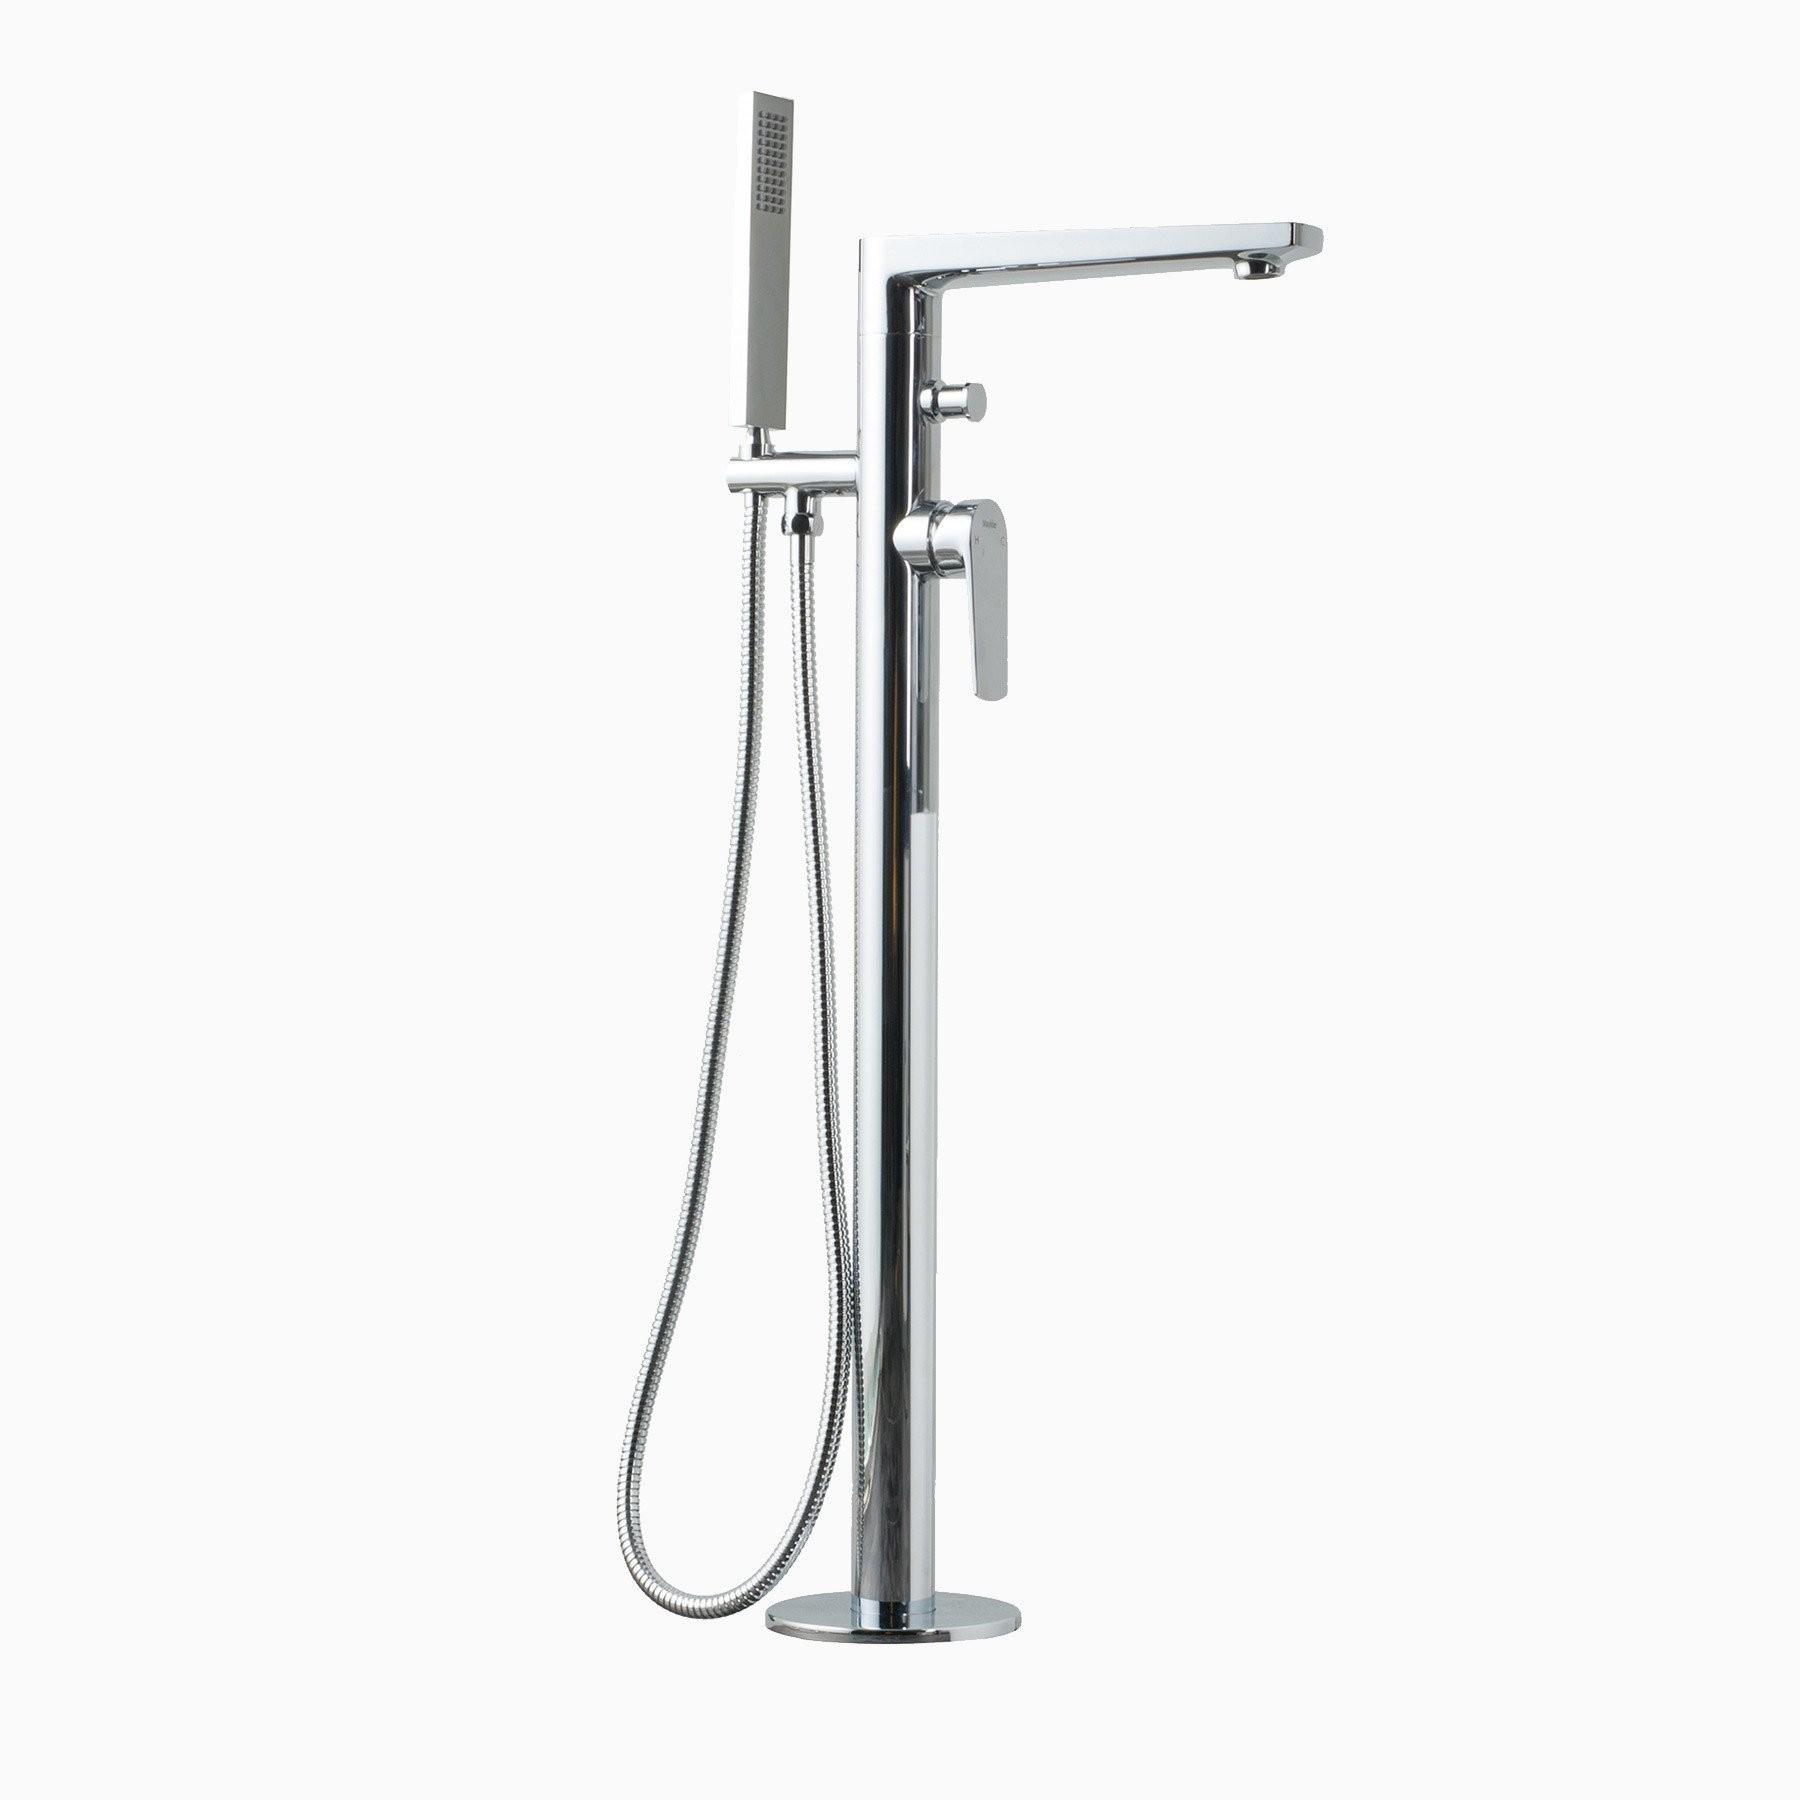 Adalbert Freestanding Single Lever Bathtub Faucet, Polished Chrome